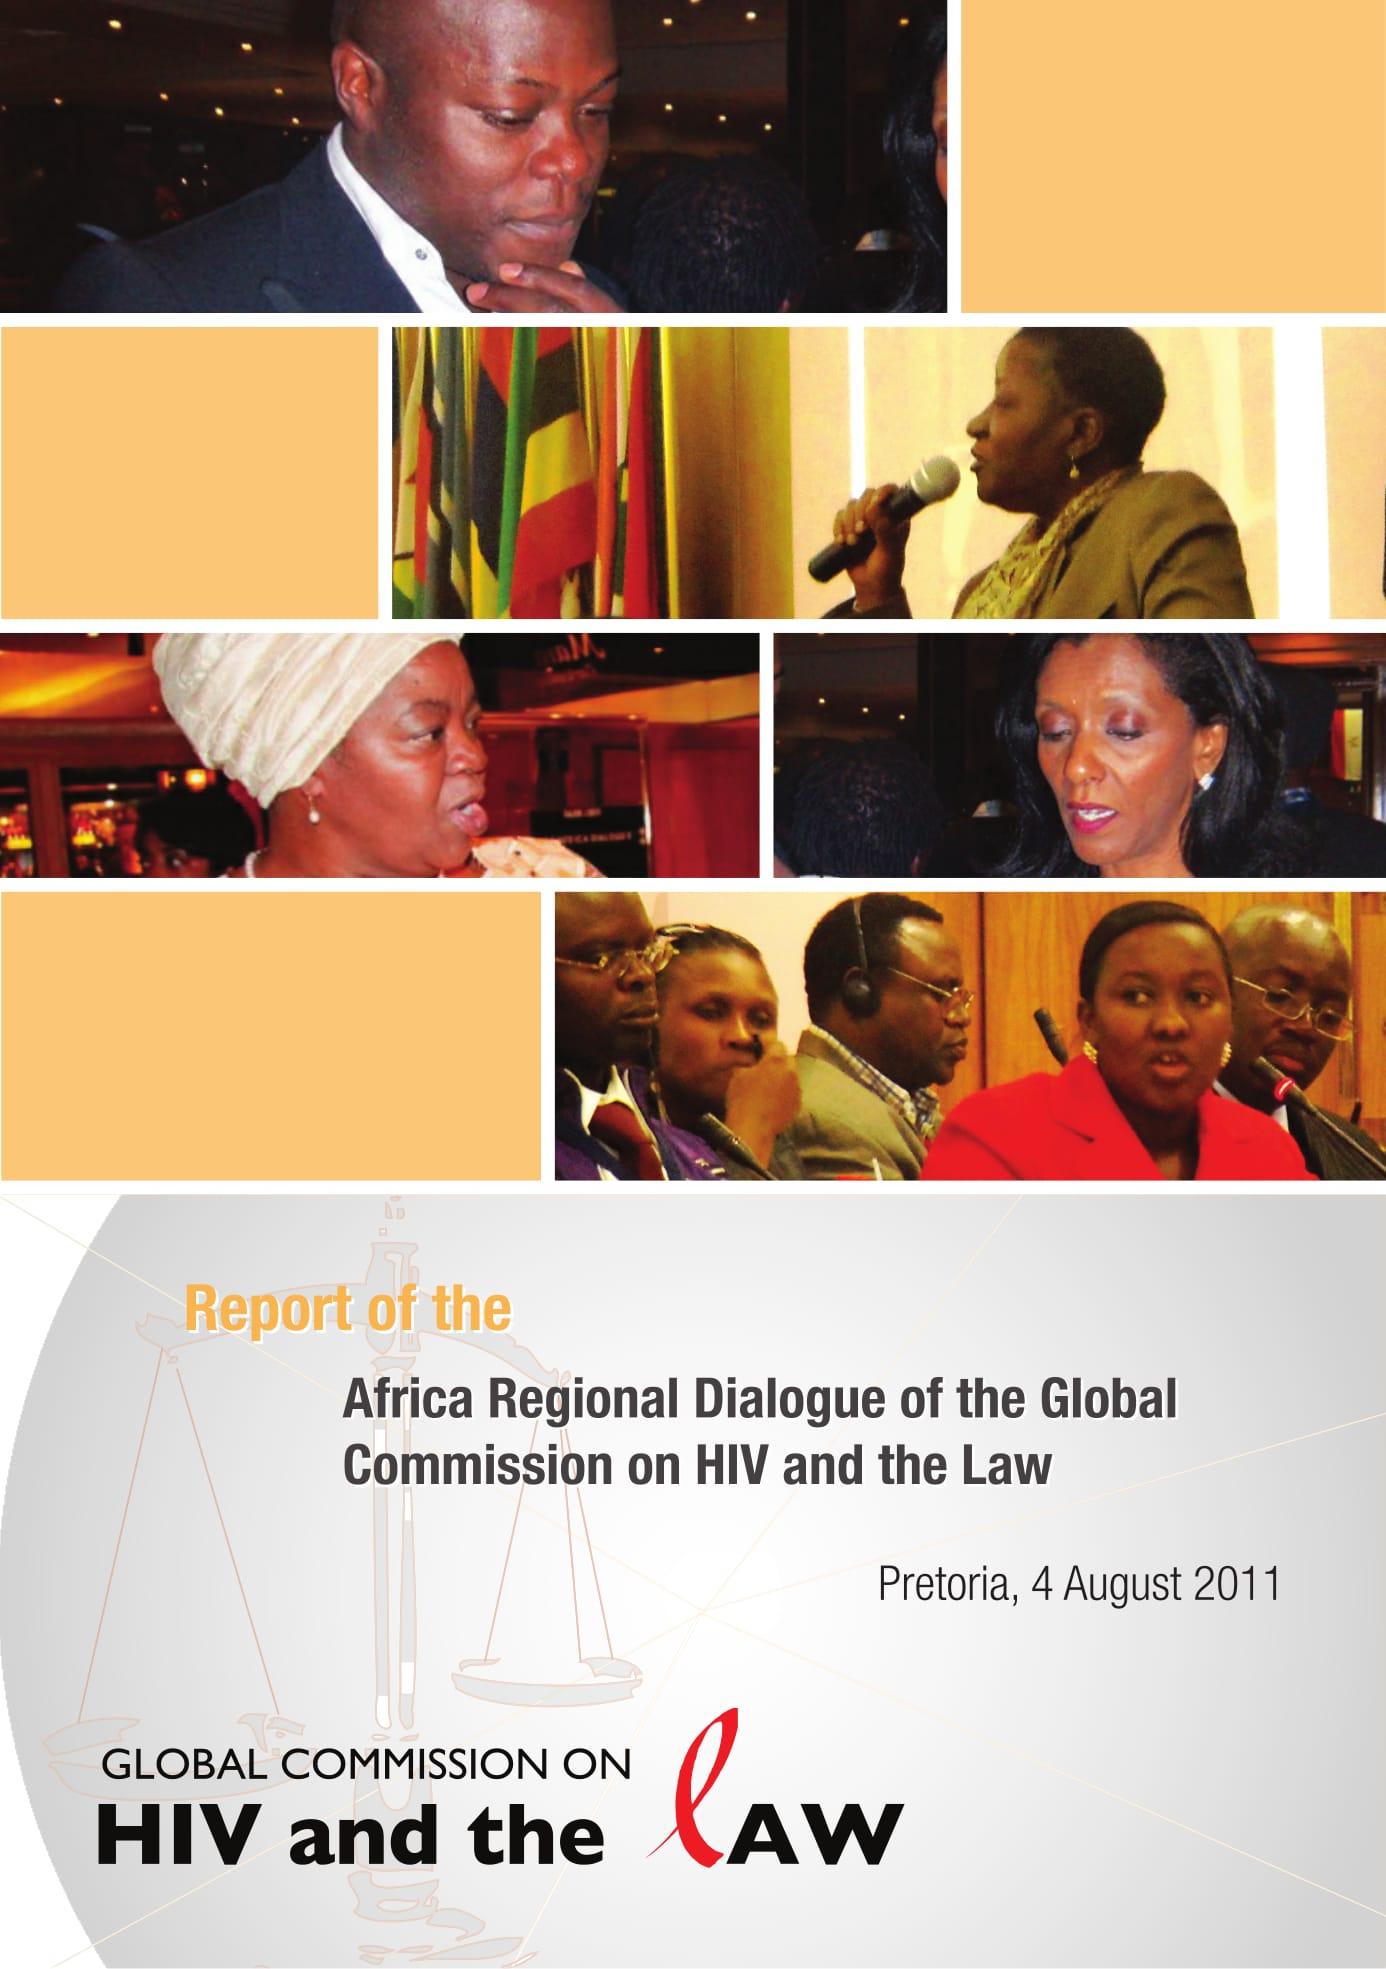 Africa Regional Dialogue Report